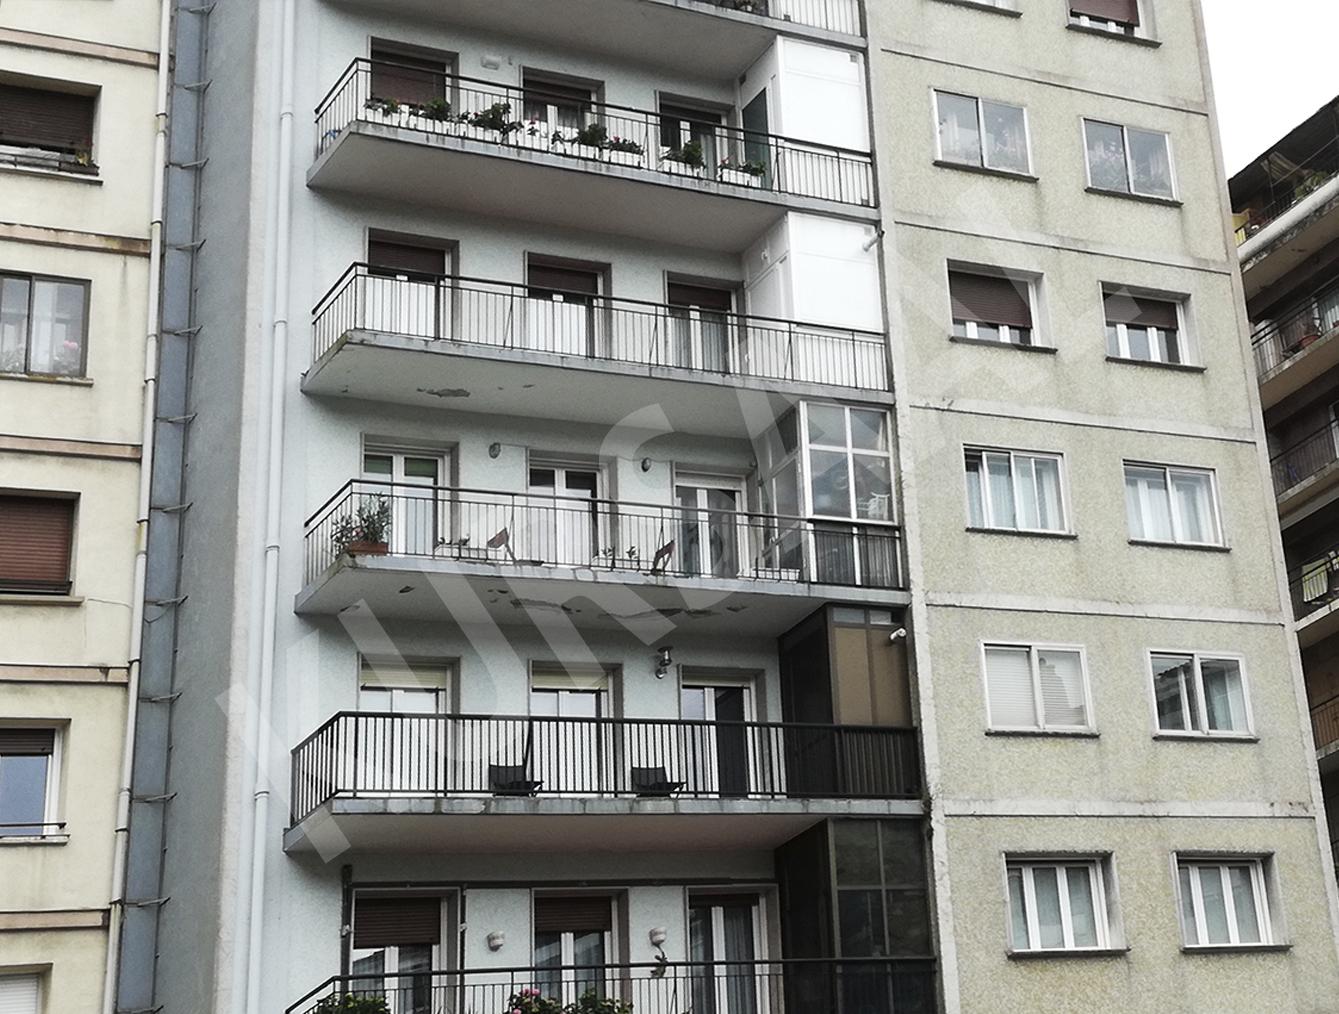 foto 3 - Aislamientos Térmicos y Eficiencia Energética-Isabel II, 14-DONOSTIA, GIPUZKOA